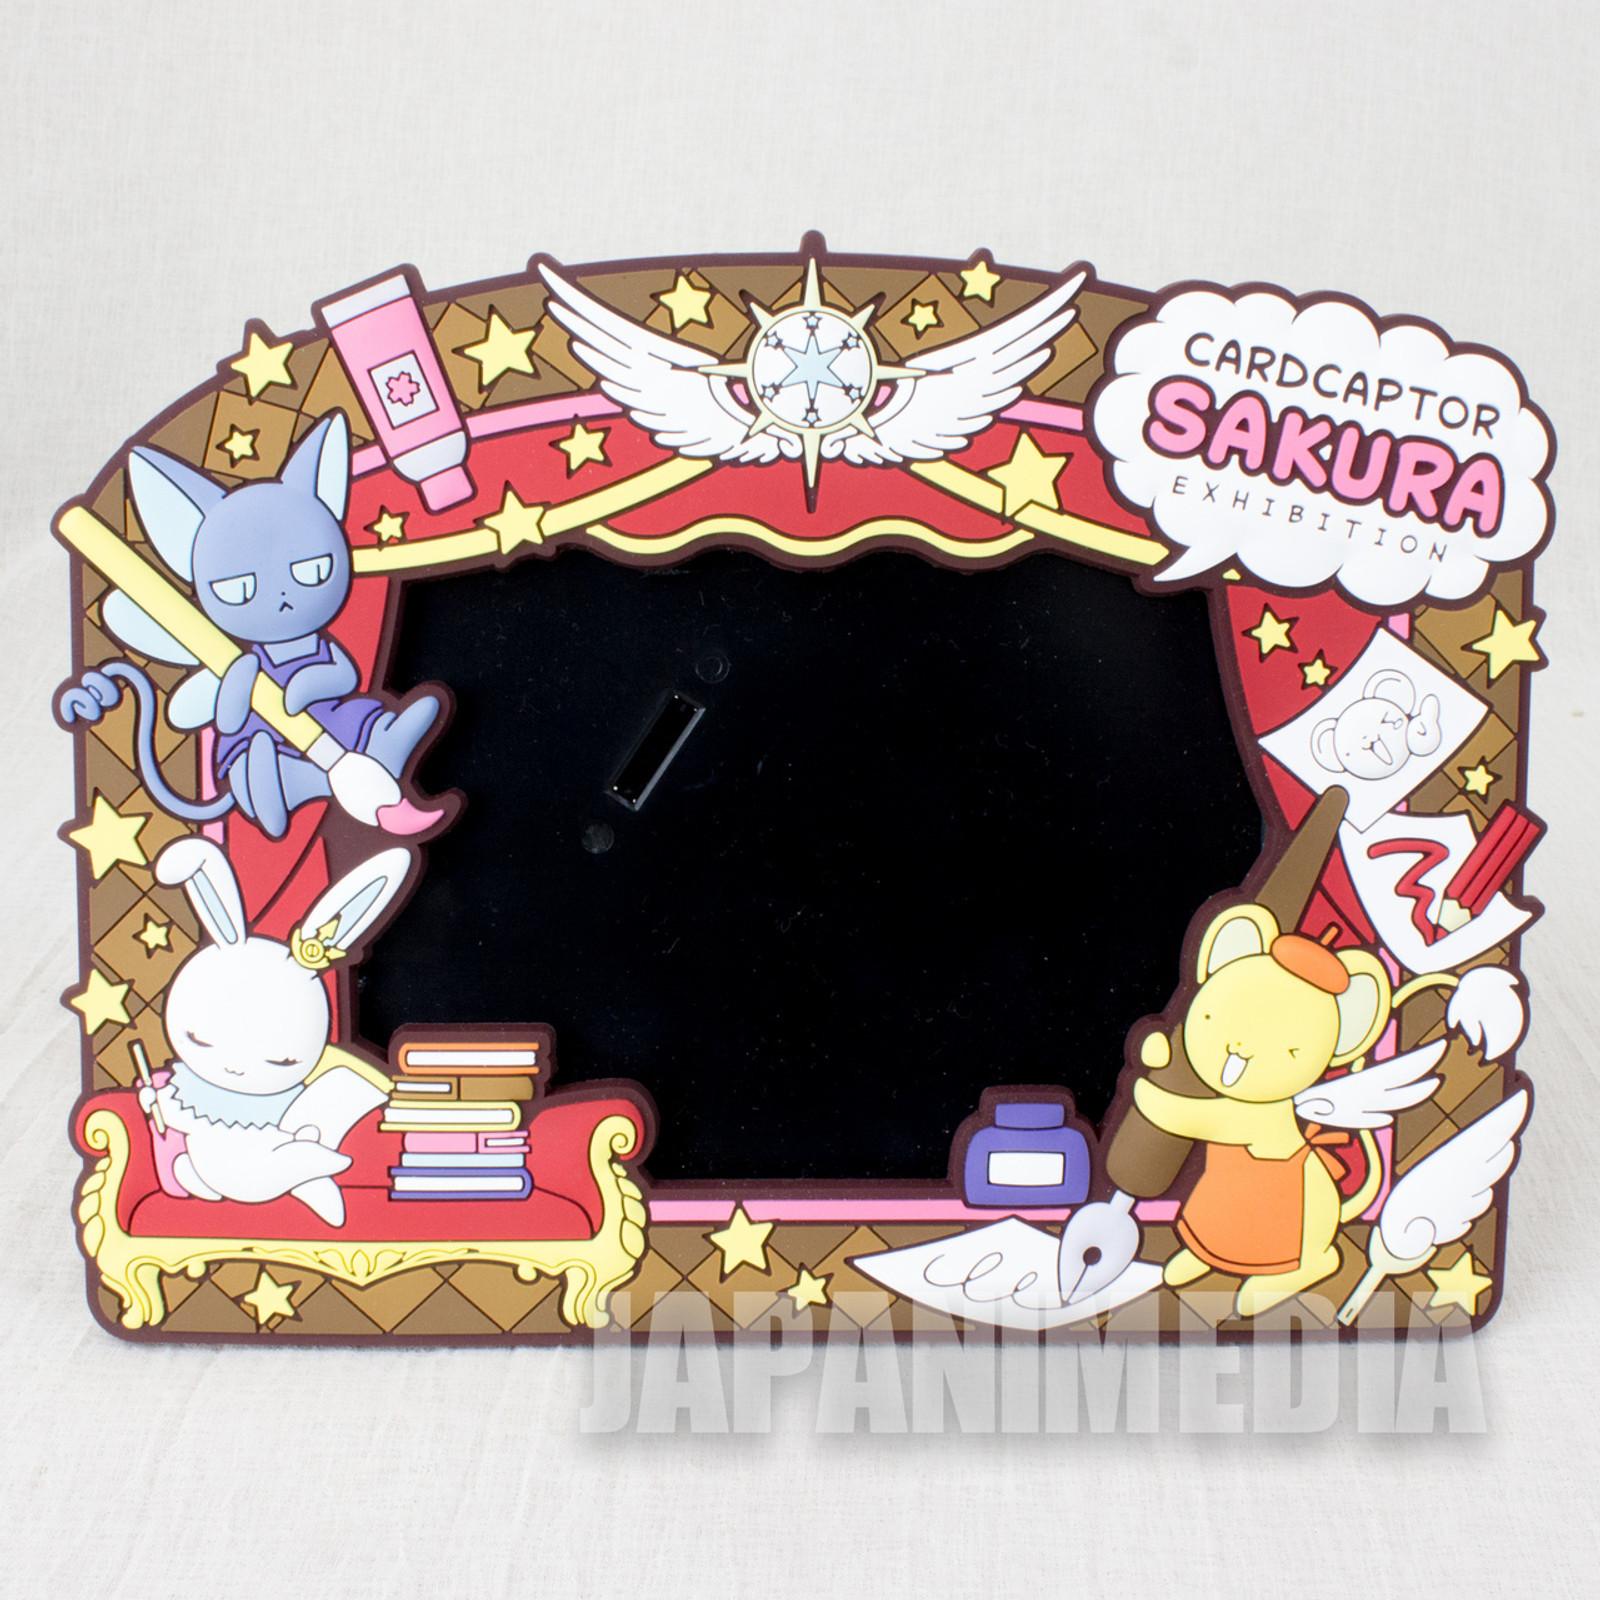 Cardcaptor Sakura Exhibition Rubber Picture Frames Photo JAPAN ANIME MANGA